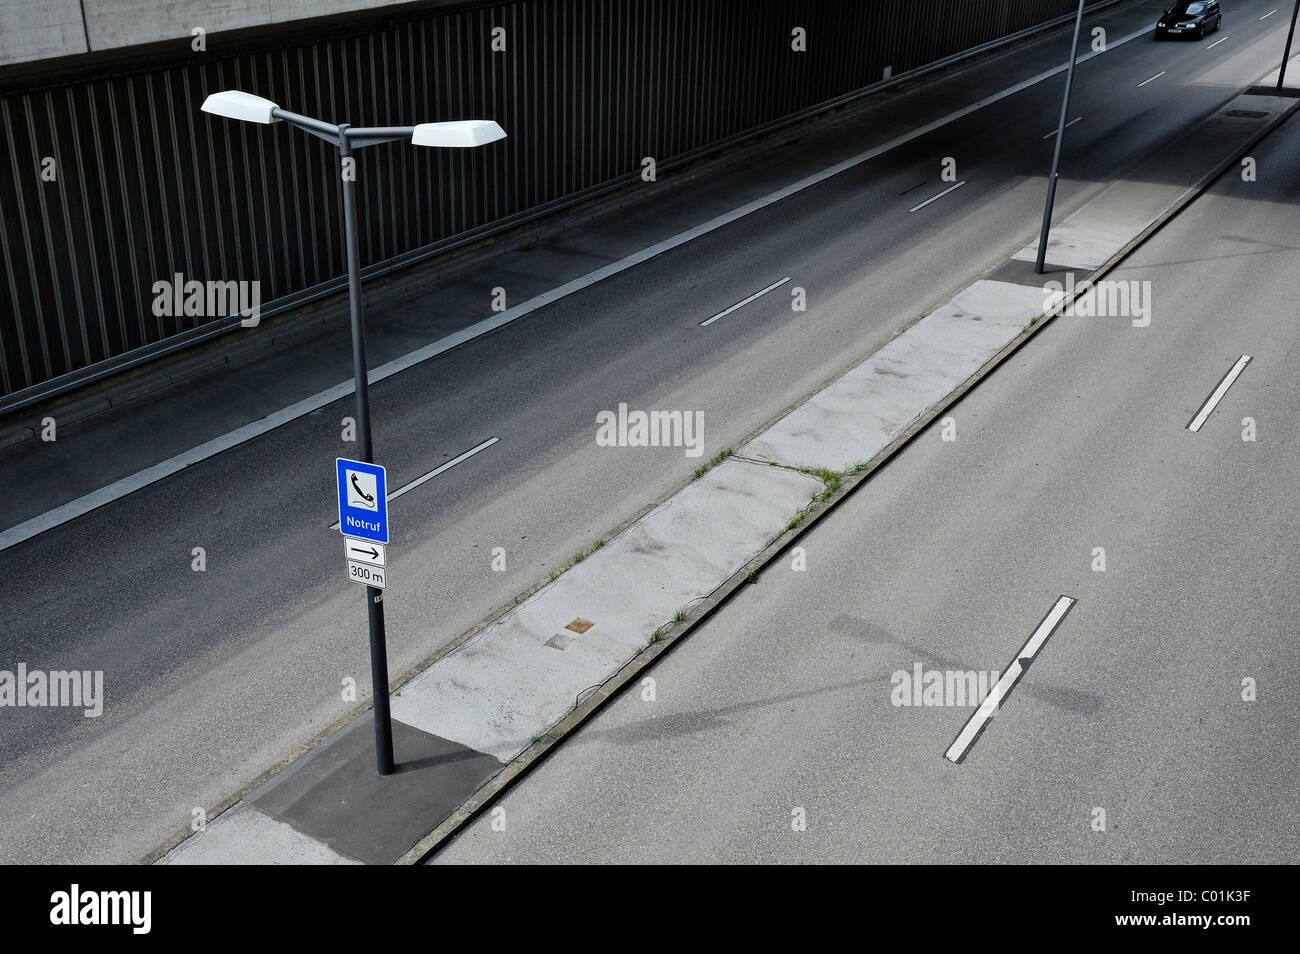 Tegernseer Landstrasse, lowered road, Harlaching, Munich, Bavaria, Germany, Europe - Stock Image